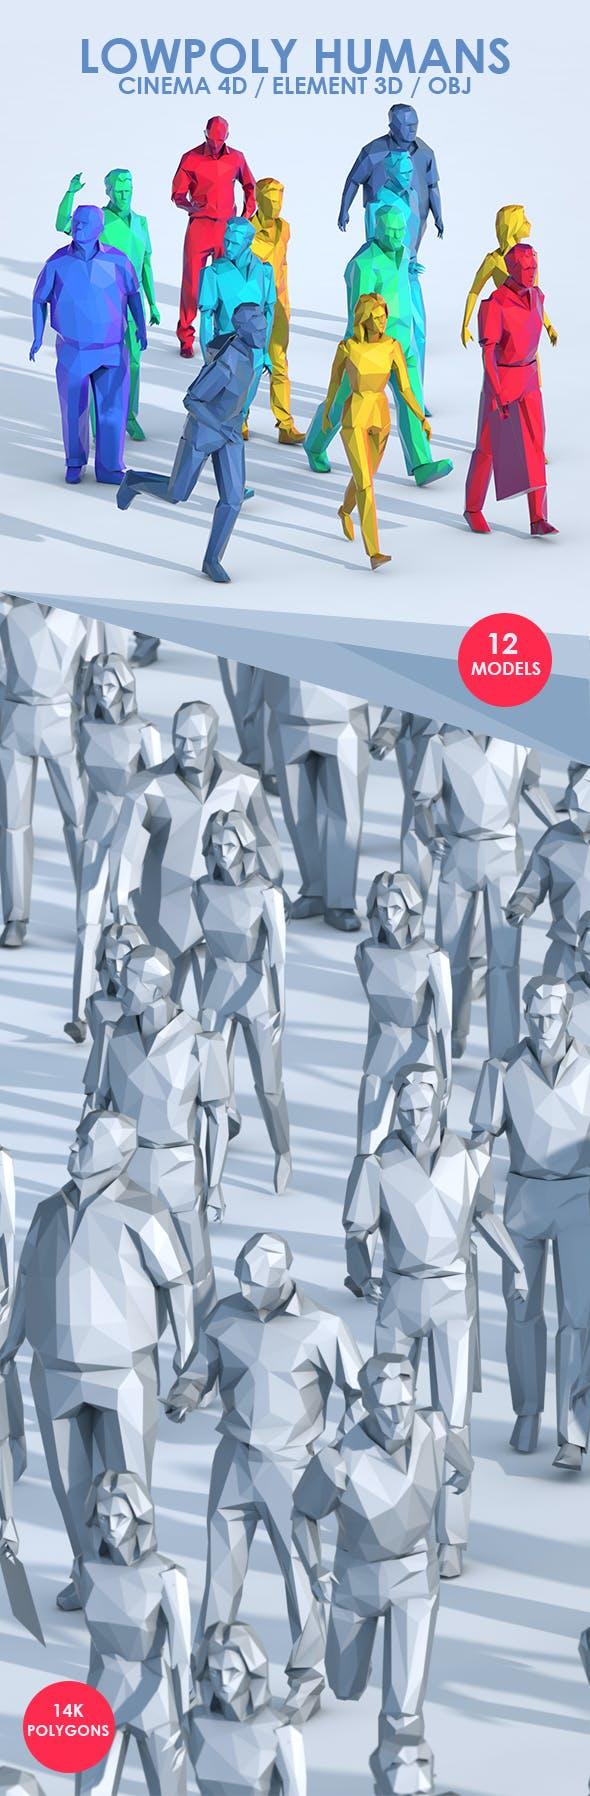 Low Poly People 3D Models for C4D & E3D - 3DOcean Item for Sale